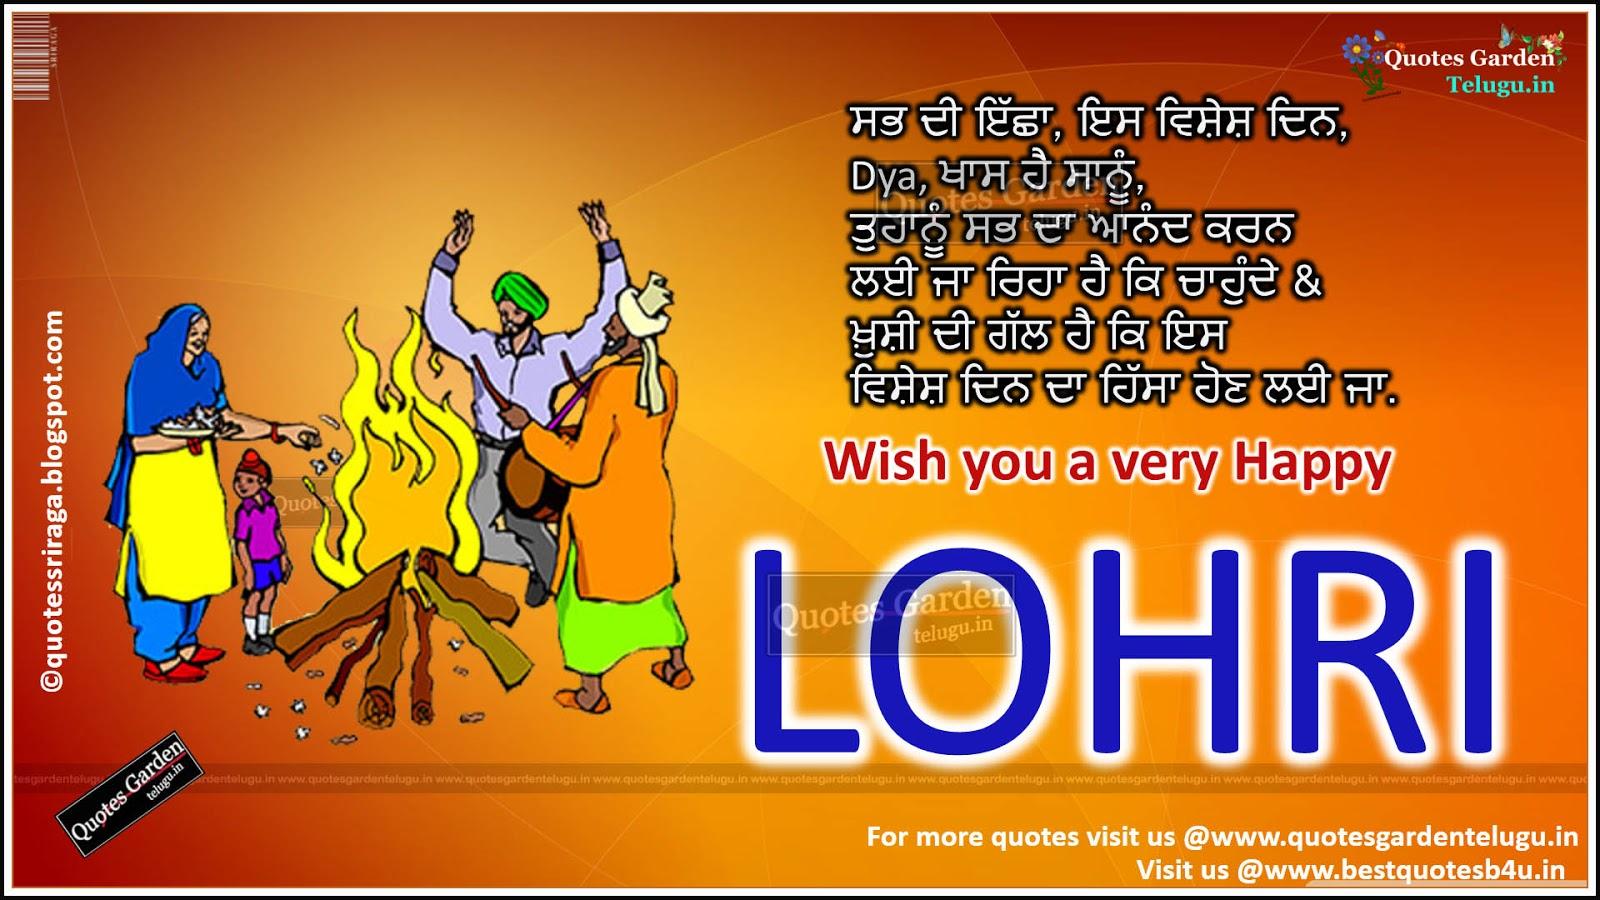 Happy Lohri 2016 Greetings Quotes in Panjabi1   QUOTES ...